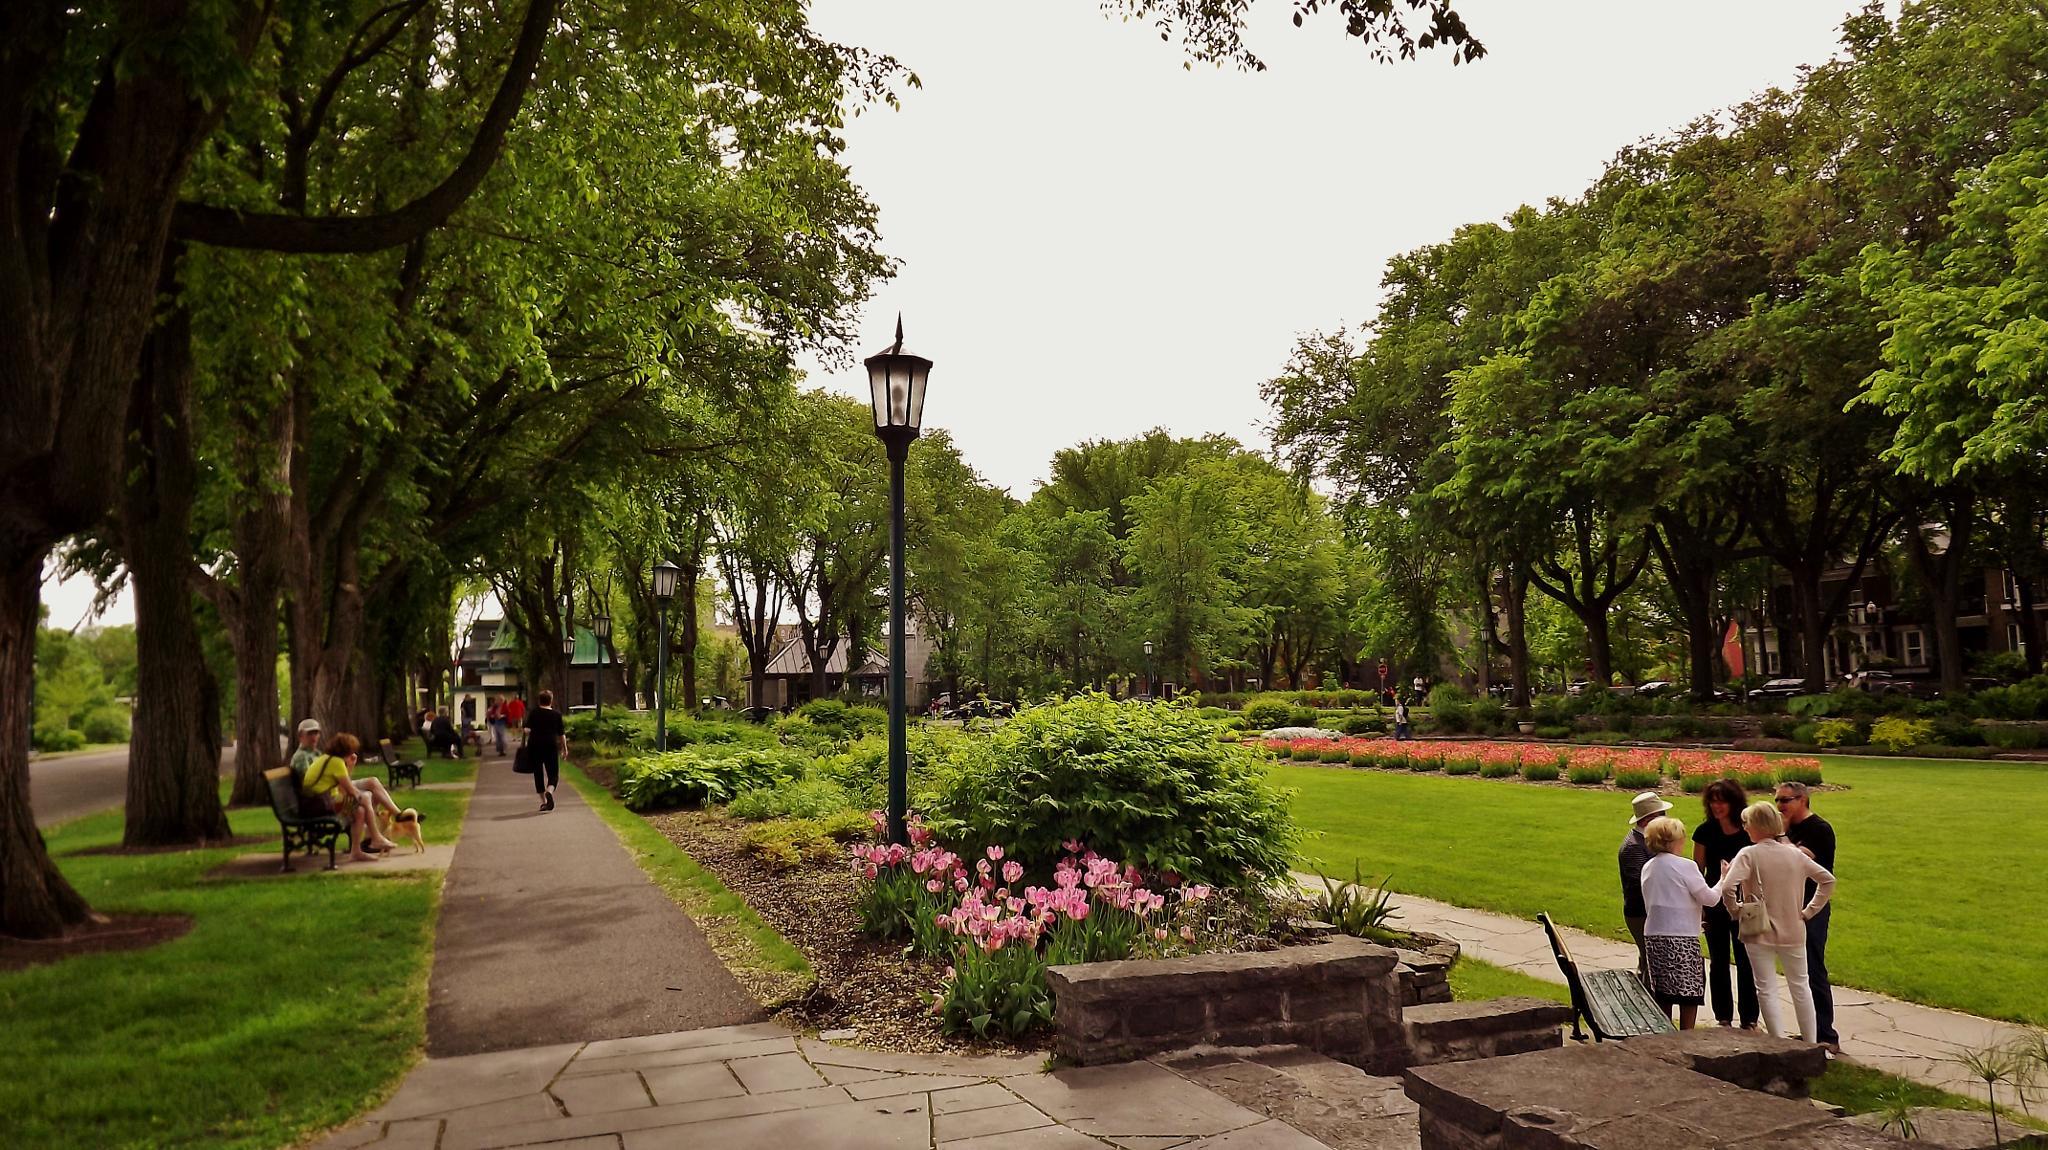 Park Jeanne-d'Arc garden by real.michaud.5036